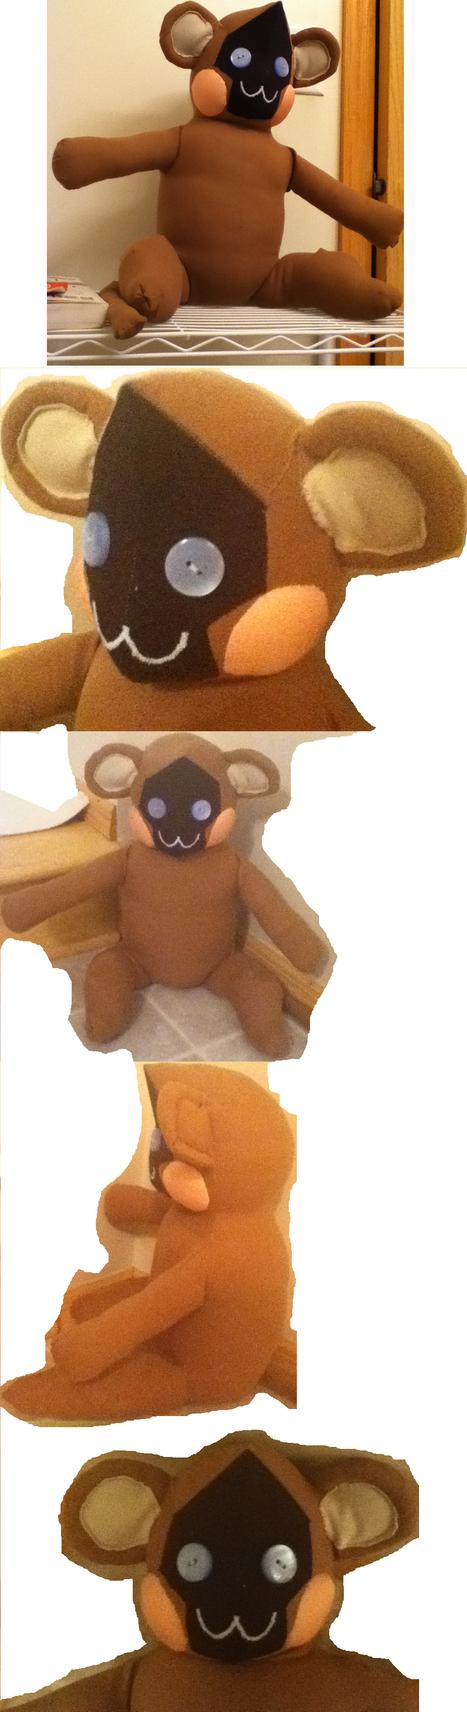 Tristan Robot Monkey Plushie by FoggyPebble